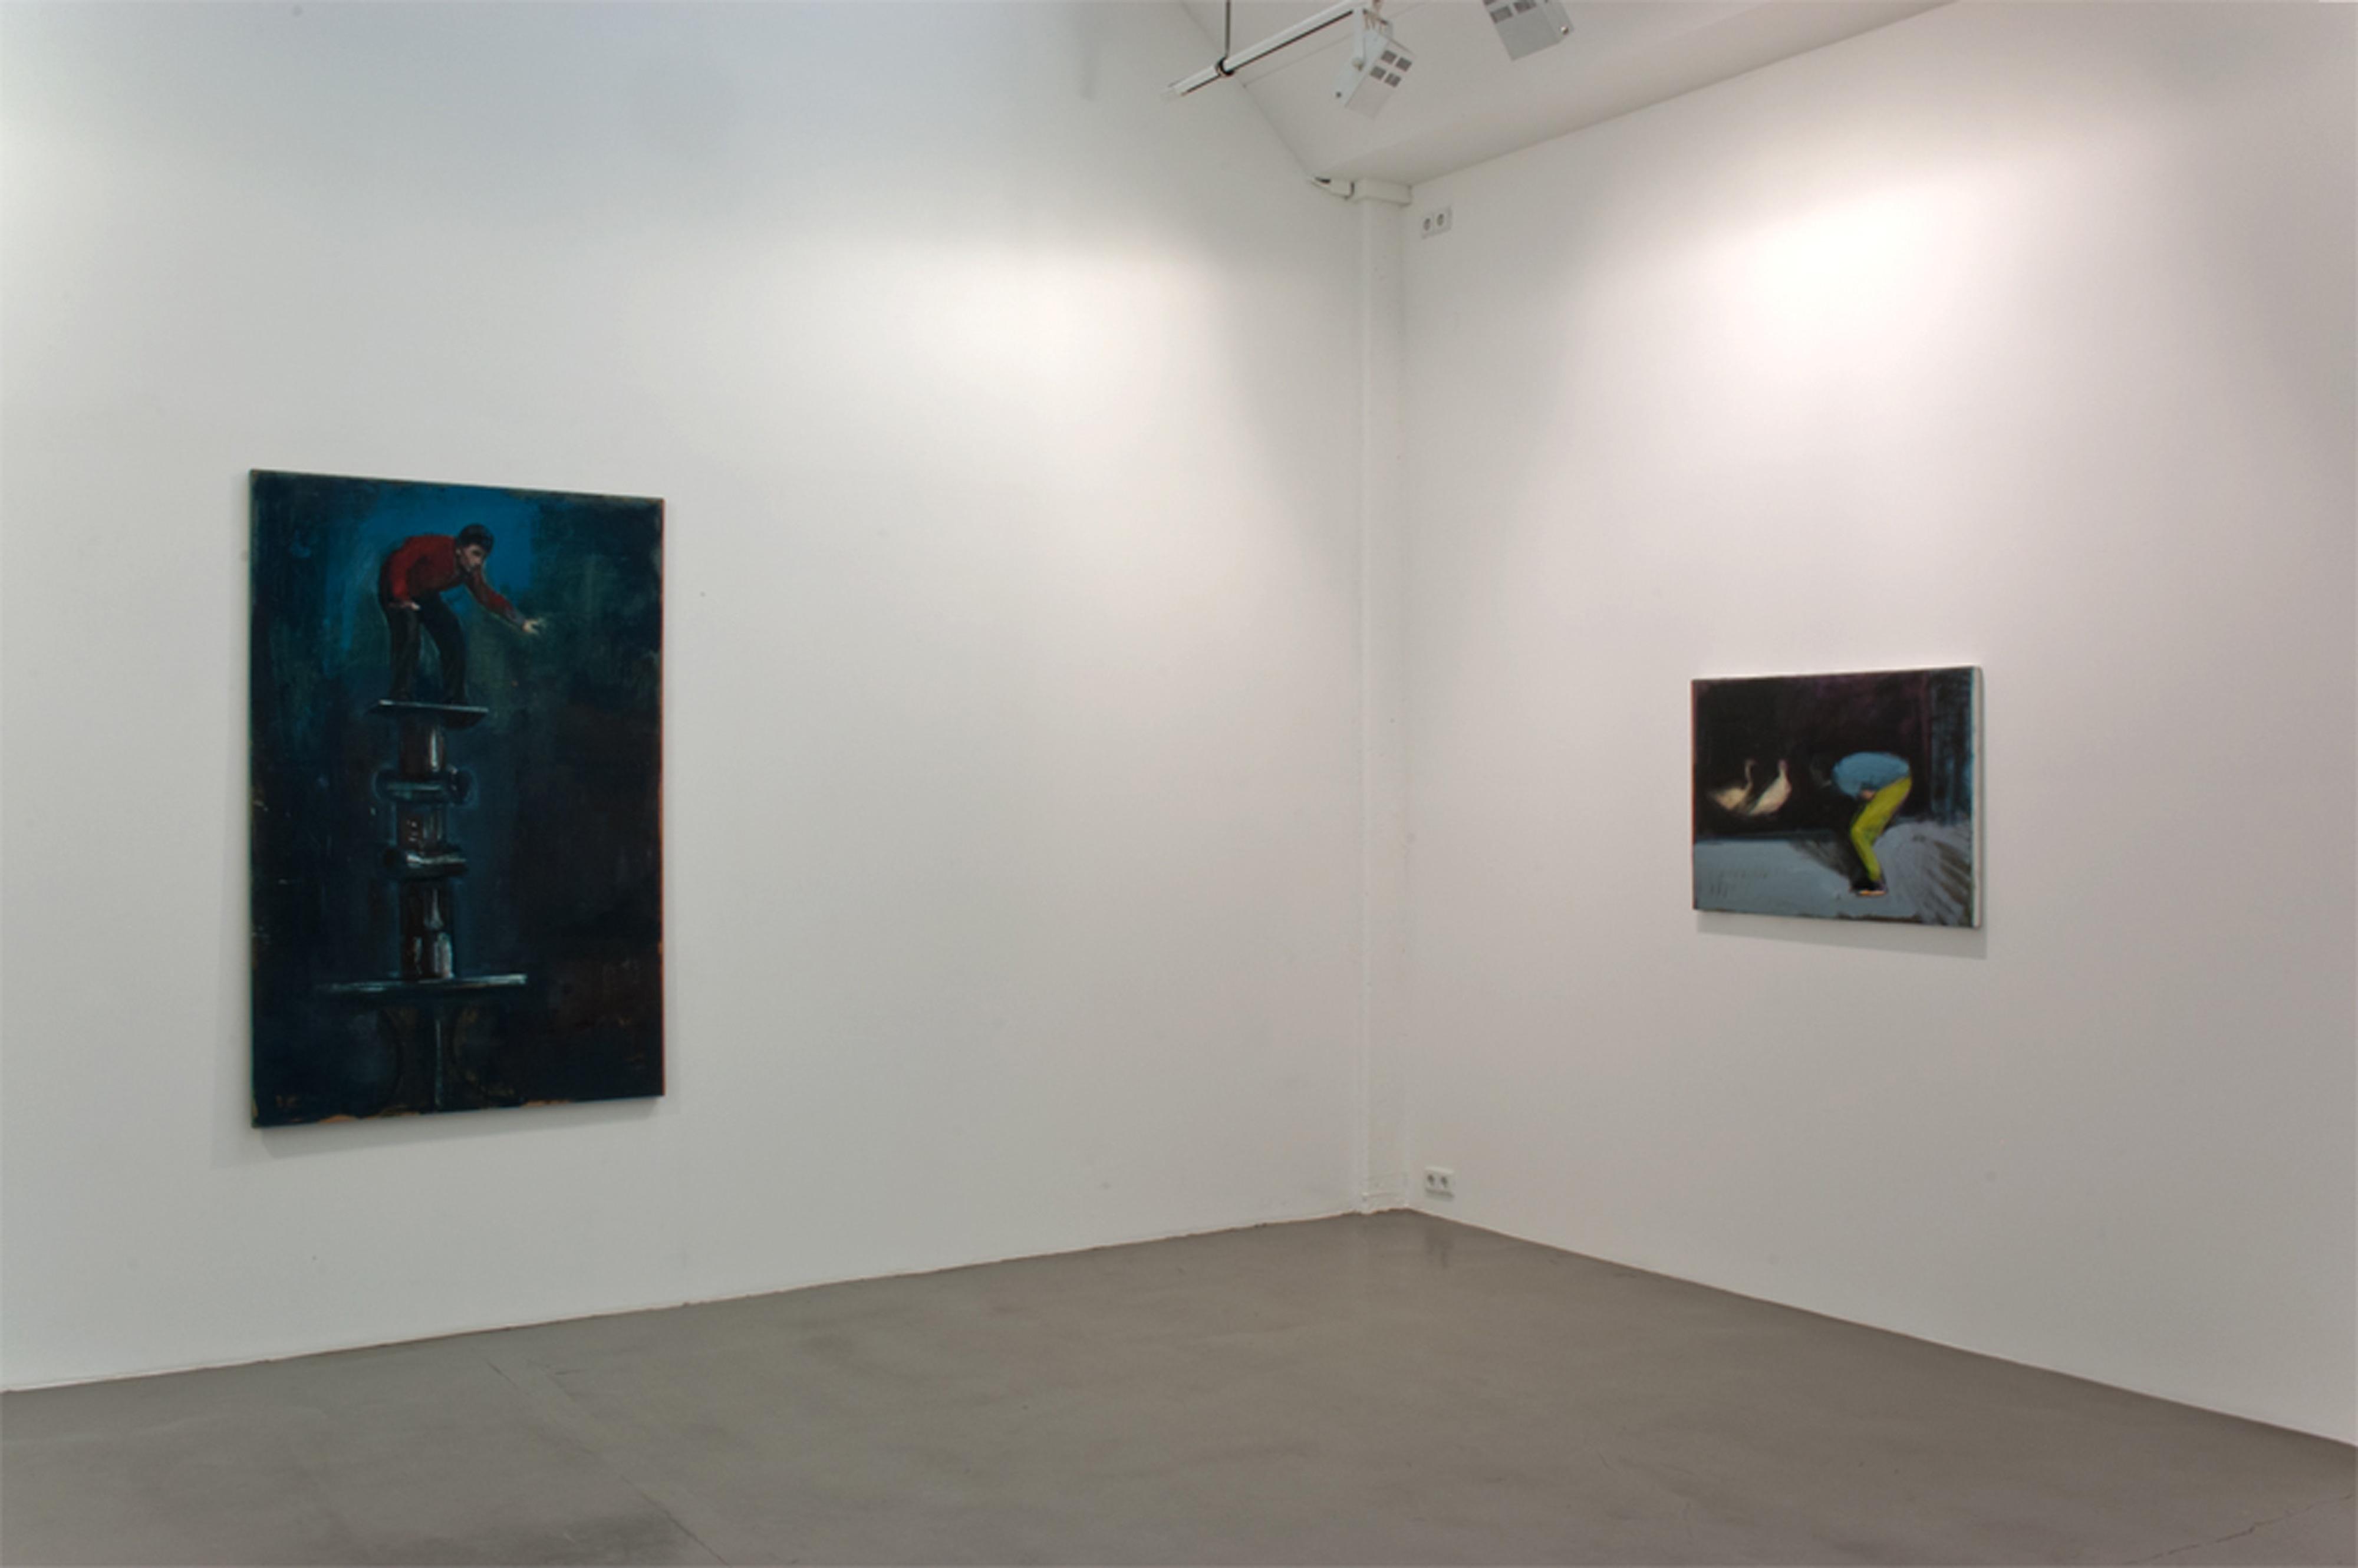 Galerie Barbara Thumm \ Simon Cantemir Hausì – What Do You See?